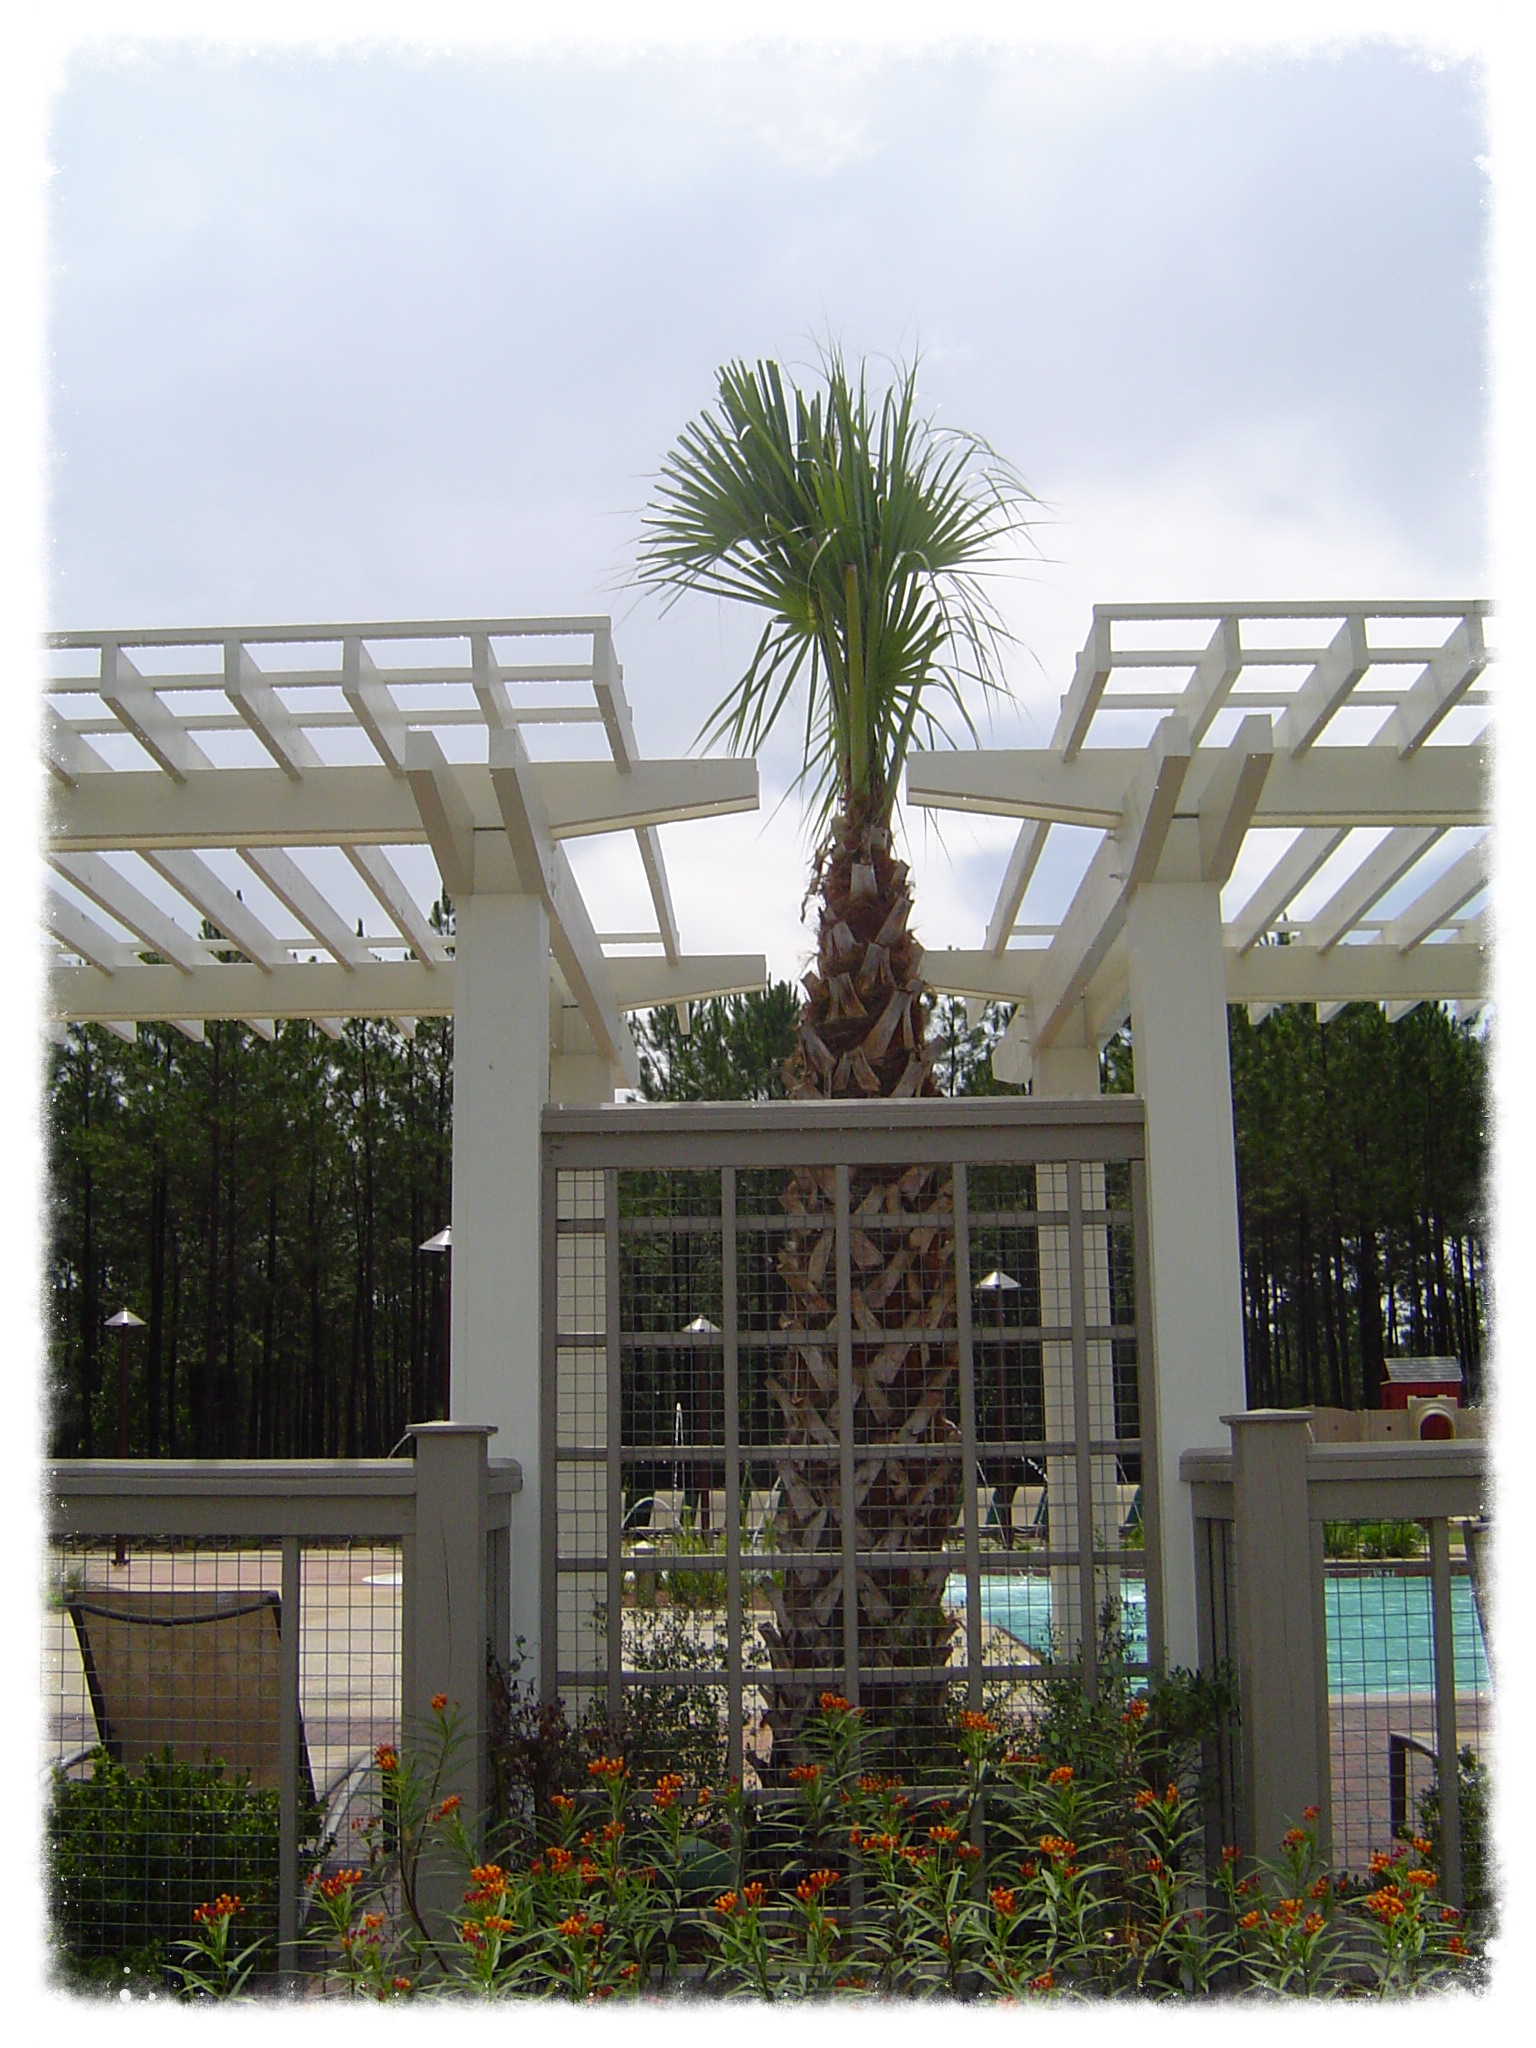 Trellis with Decorative Fence